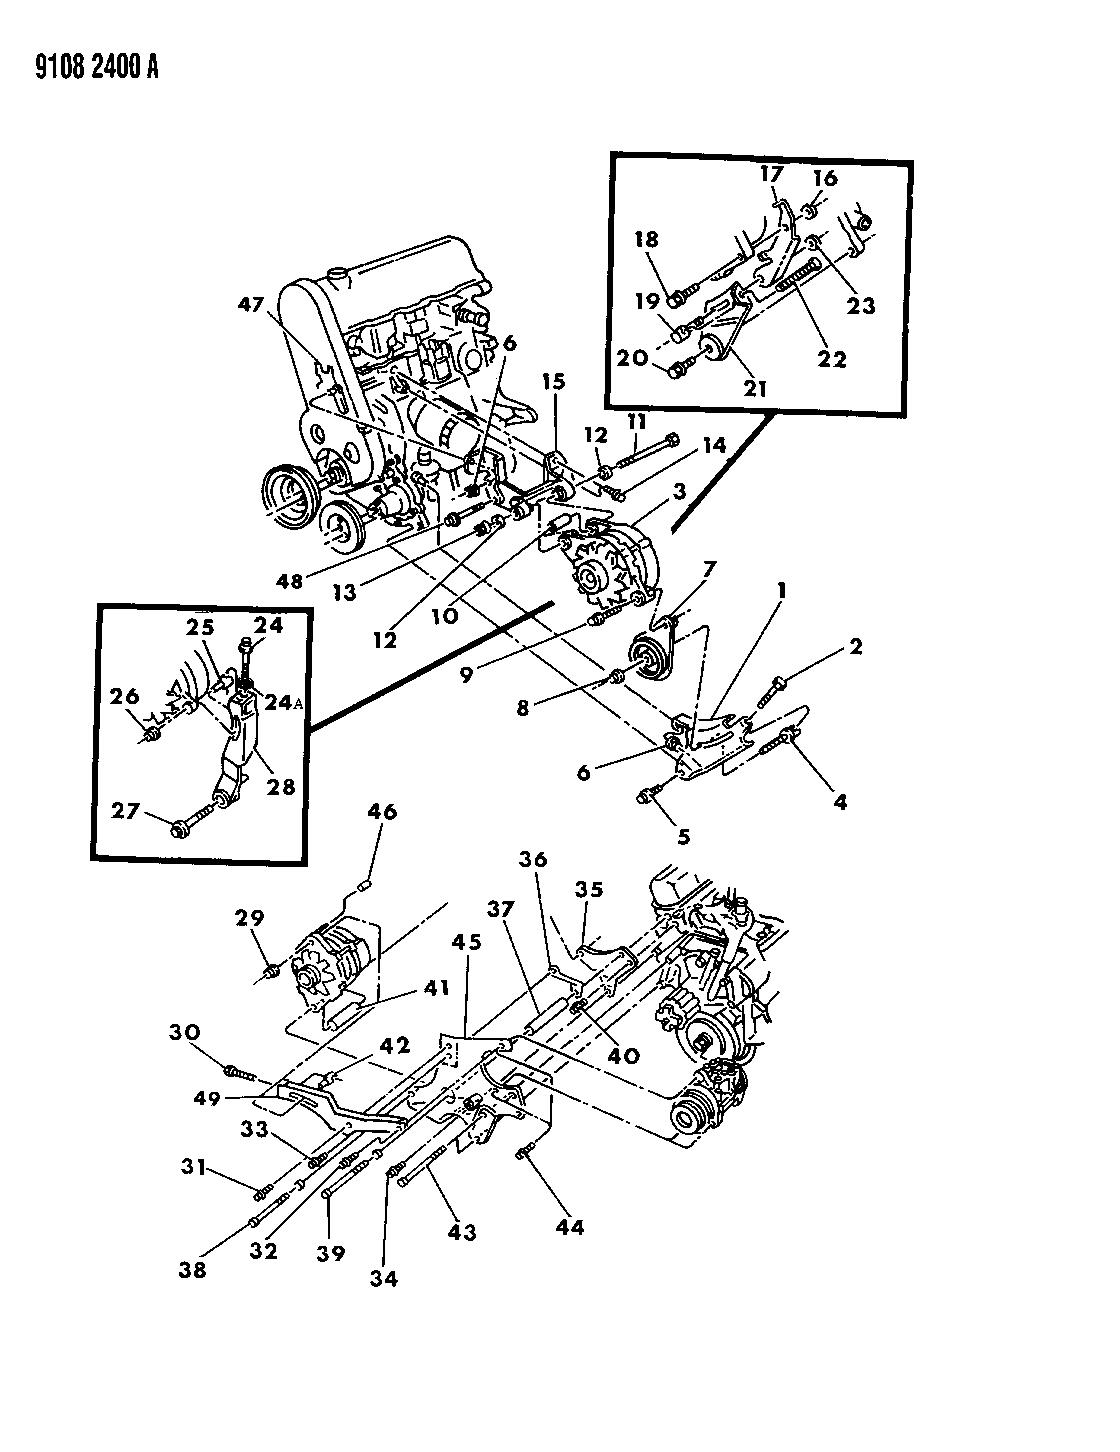 1989 chrysler lebaron gtc alternator mounting rh moparpartsgiant com 1970 Dodge Truck Wiring Diagrams 1970 Dodge Truck Wiring Diagrams